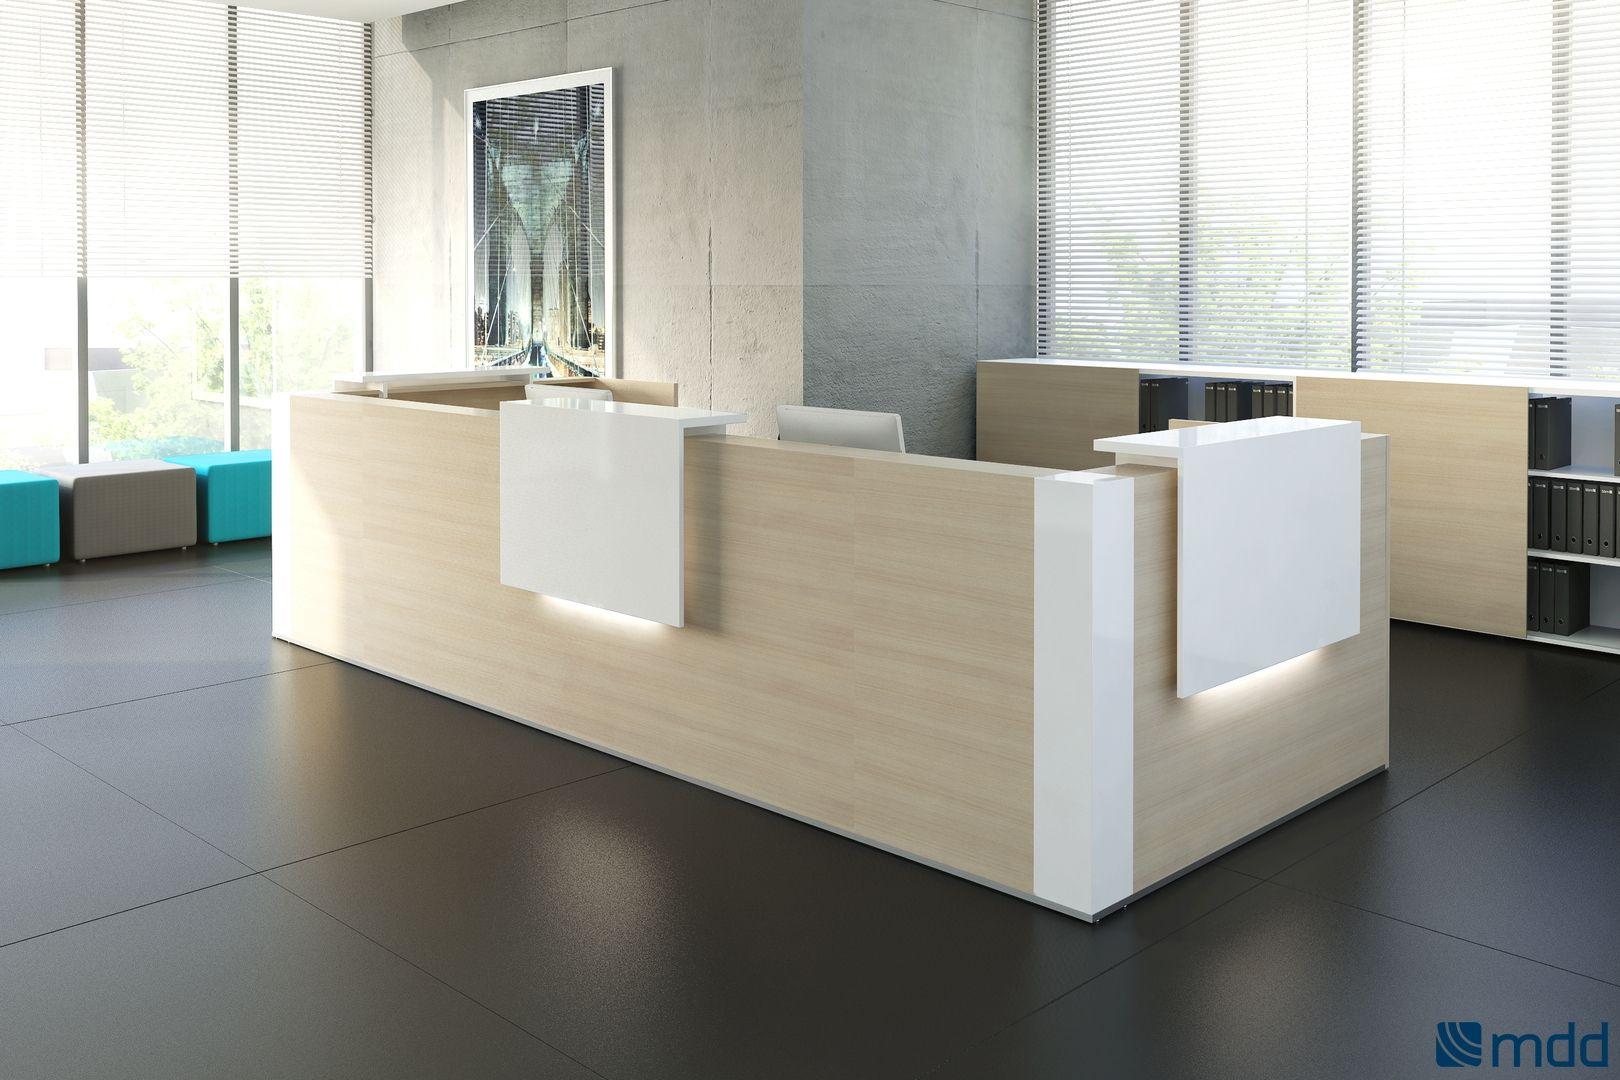 Oficina / Recepción / Diseños con Iluminación / Escritorios ...